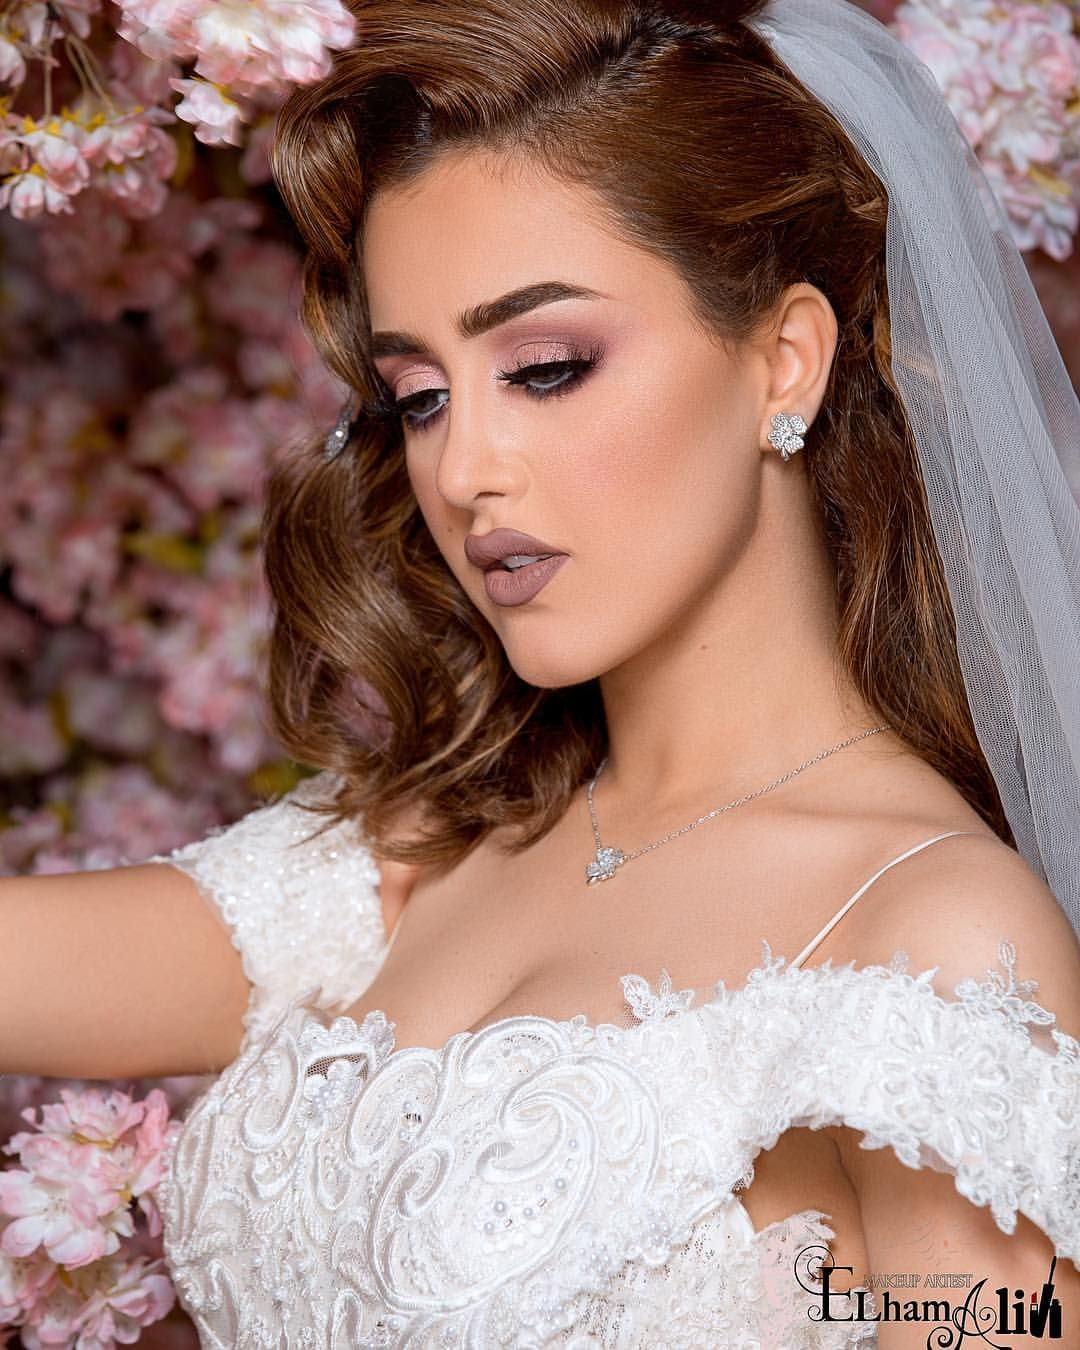 22 Likes 0 Comments بوتيك شمسه المهيري Shamsaalmehairi4 On Instagram ثوب الراقي Indian Bridal Hairstyles Bridal Makeup Looks Wedding Day Makeup